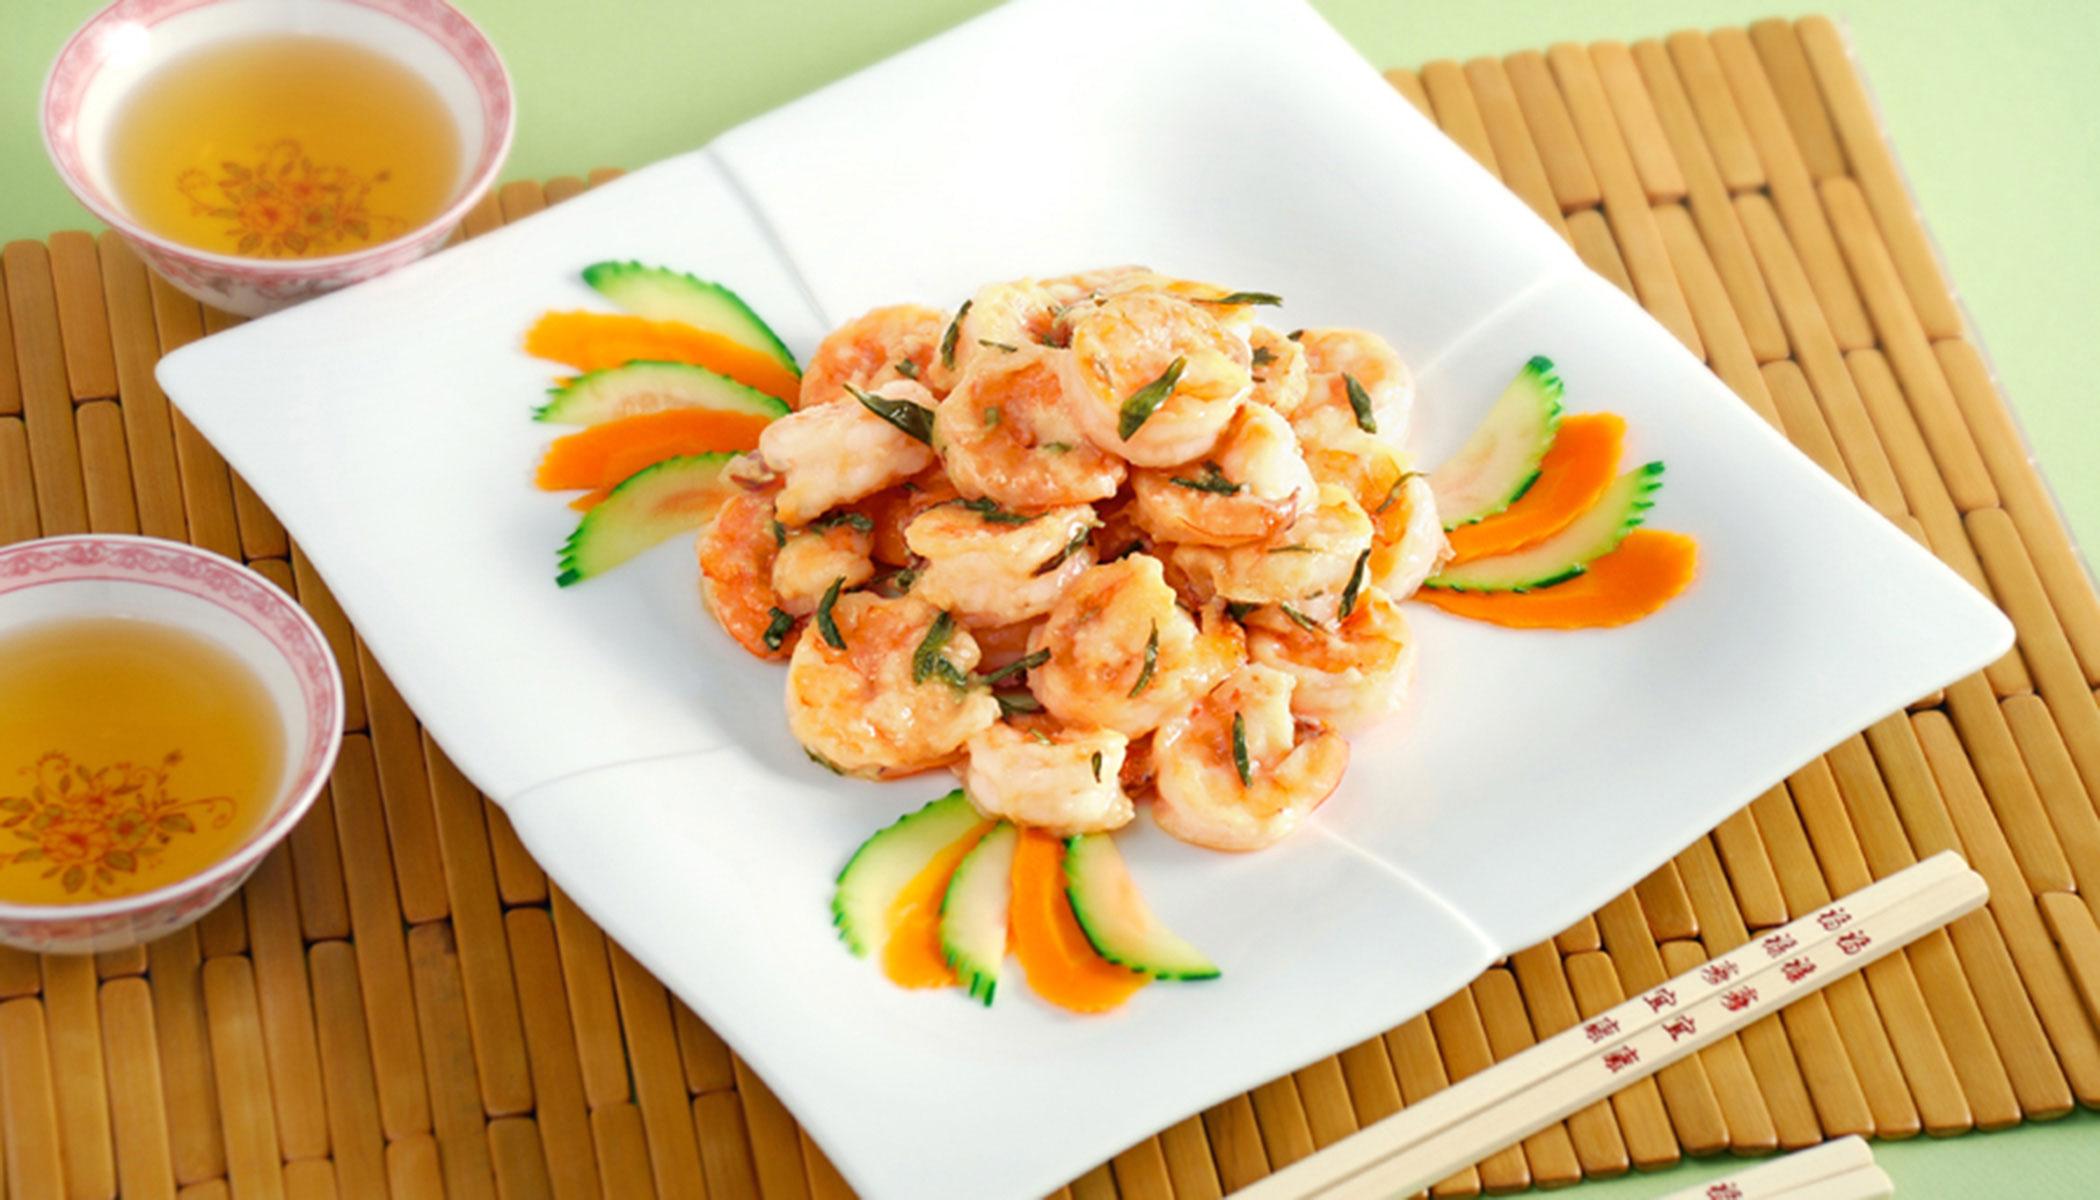 Dragon Well Shrimp (Stir-Fried Shrimp with <i>Longjing</i> Tea)